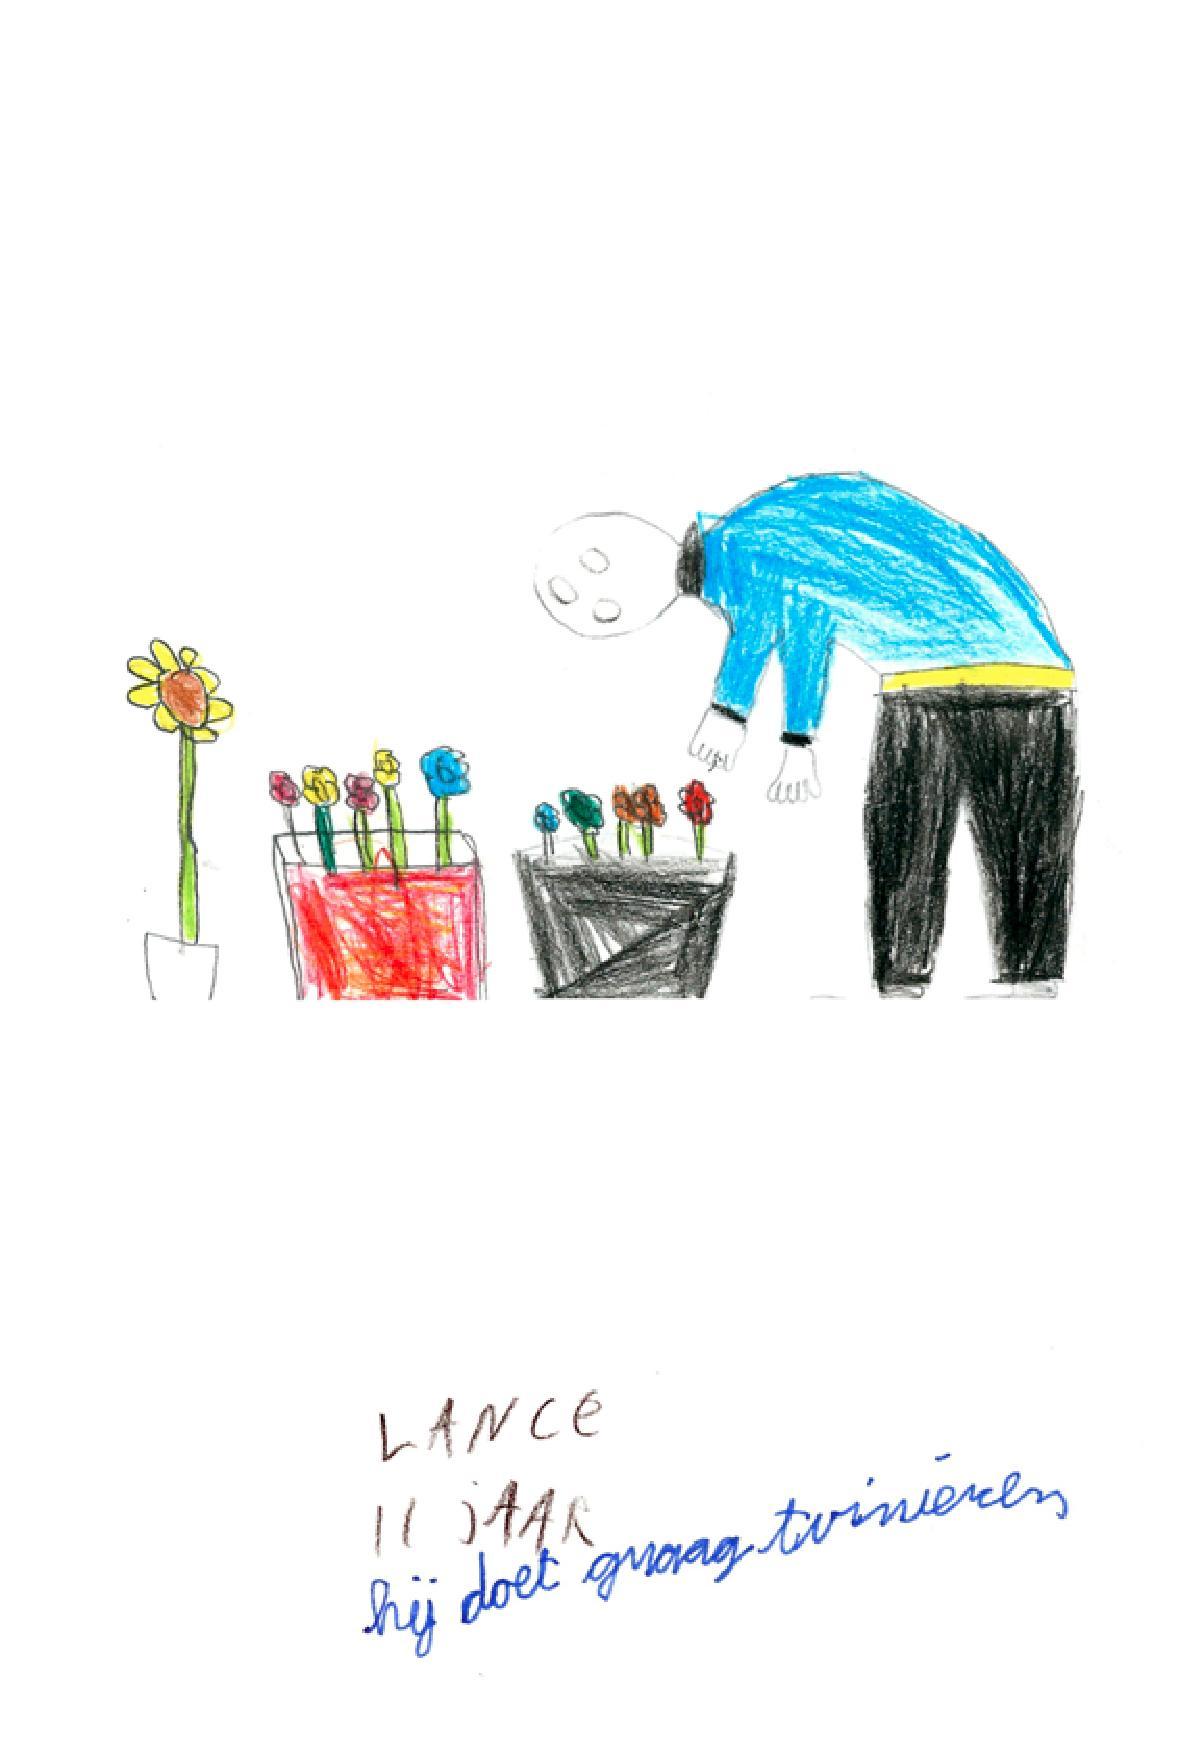 kids u0027 drawings of grandparents recreated in photographs u2013 pleated